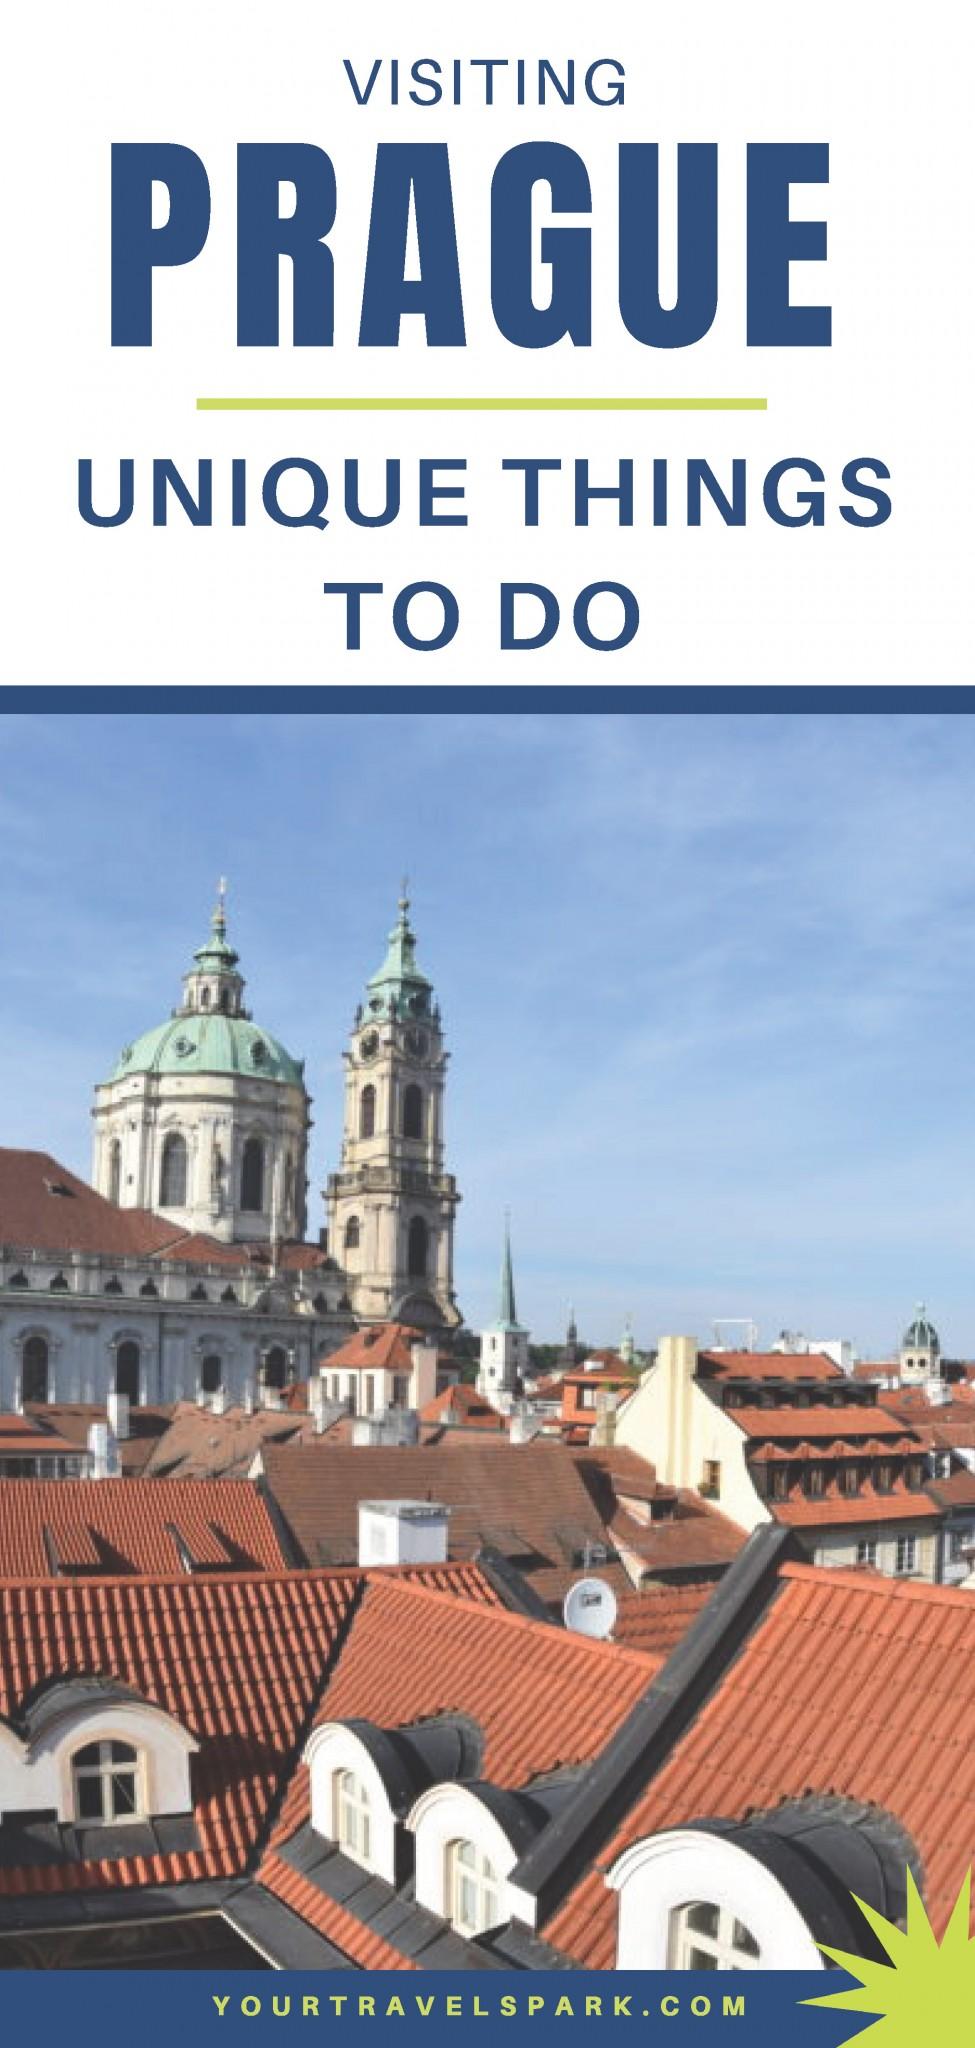 Unique things to do in Prague, Czech Republic.